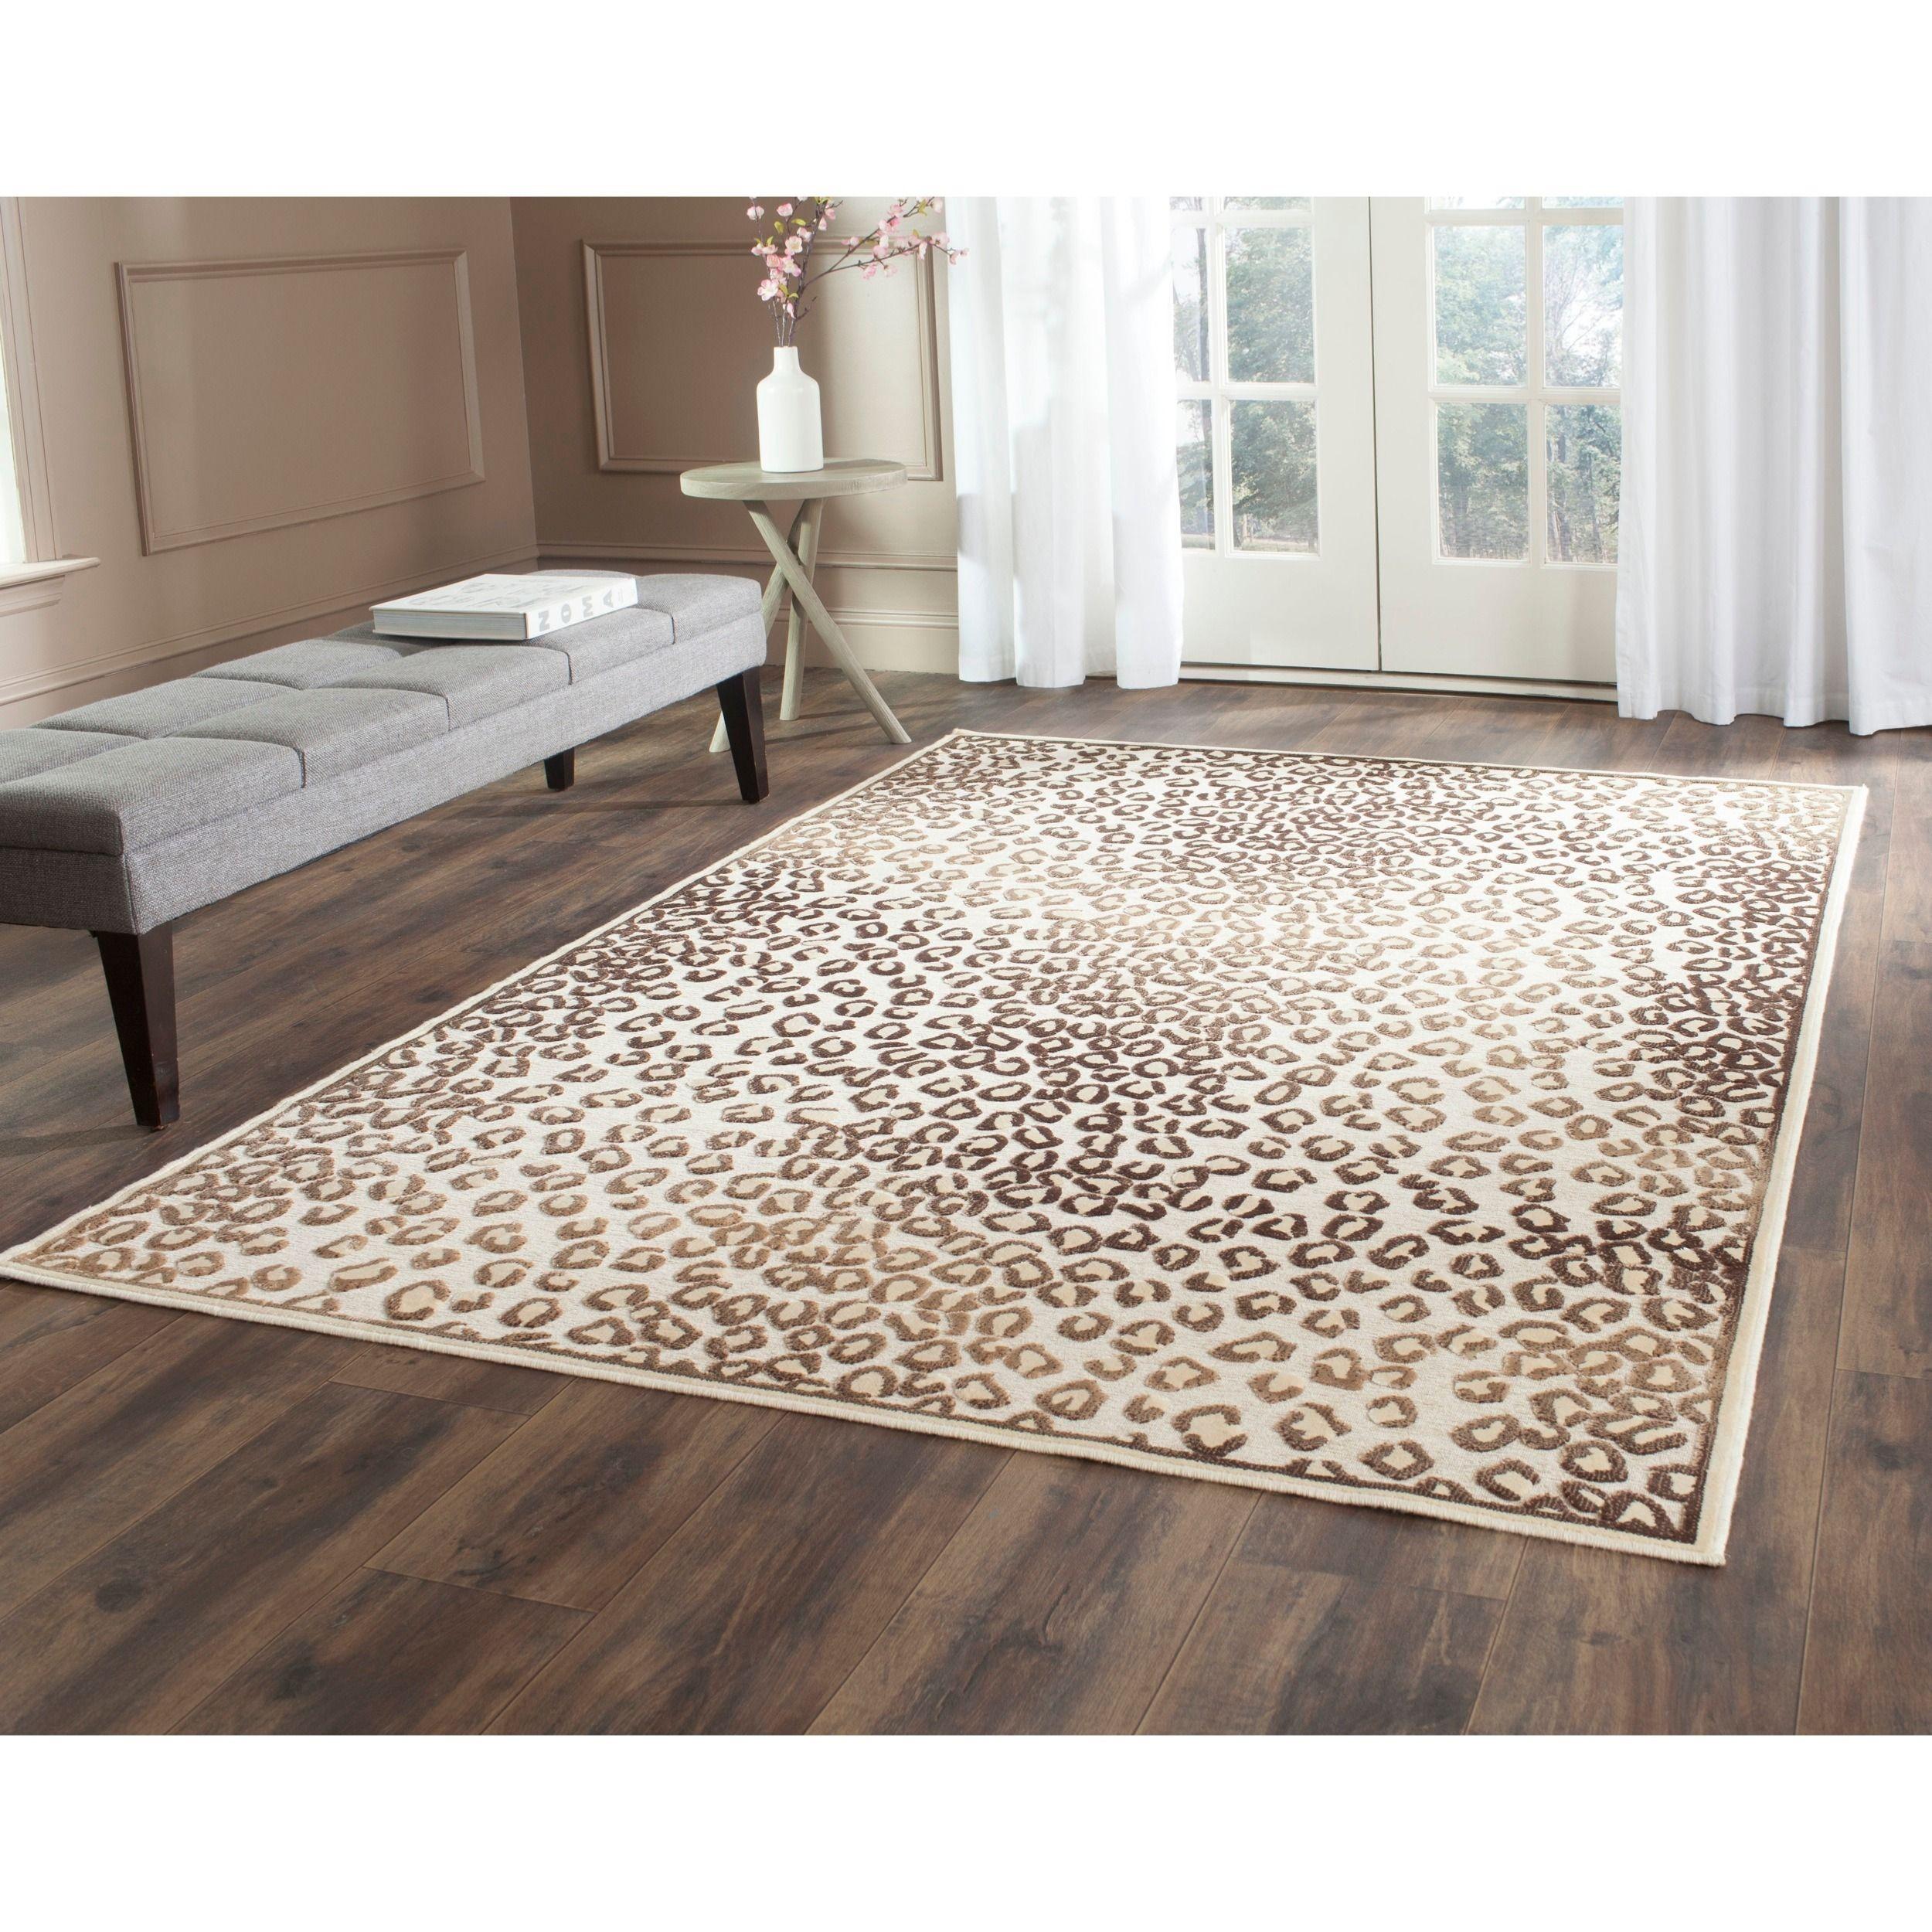 designs print sale leopard zebra area animal uk rugs rug pink